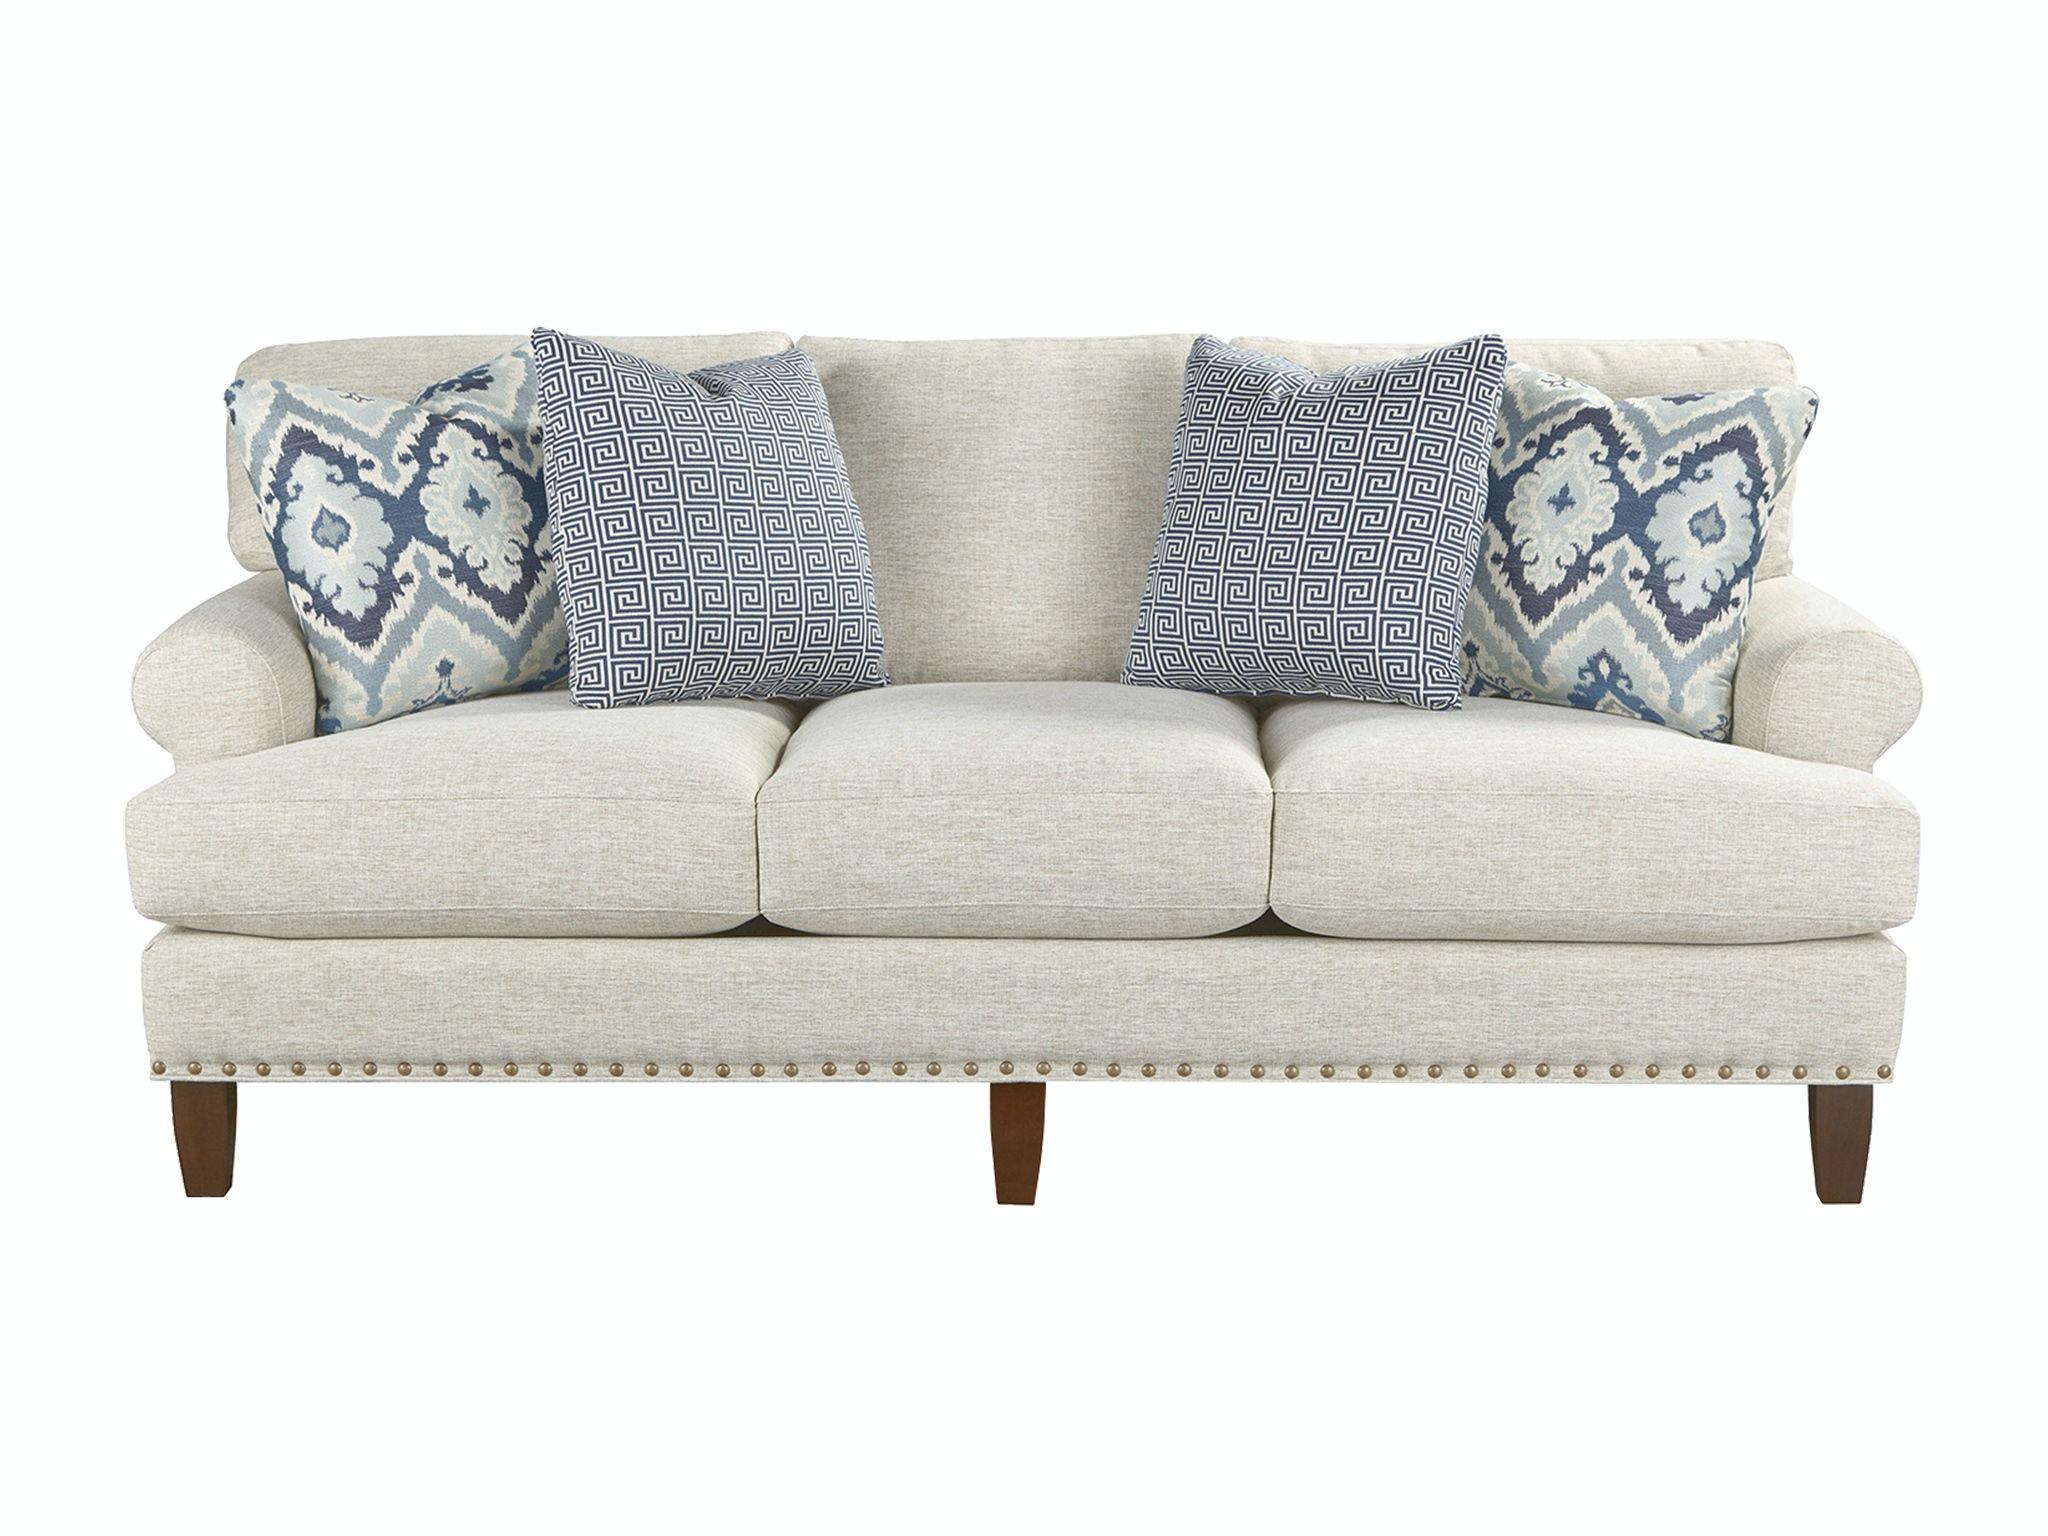 Craftmaster Living Room Sofa 767350   Slone Brothers   Longwood And  Orlando, FL